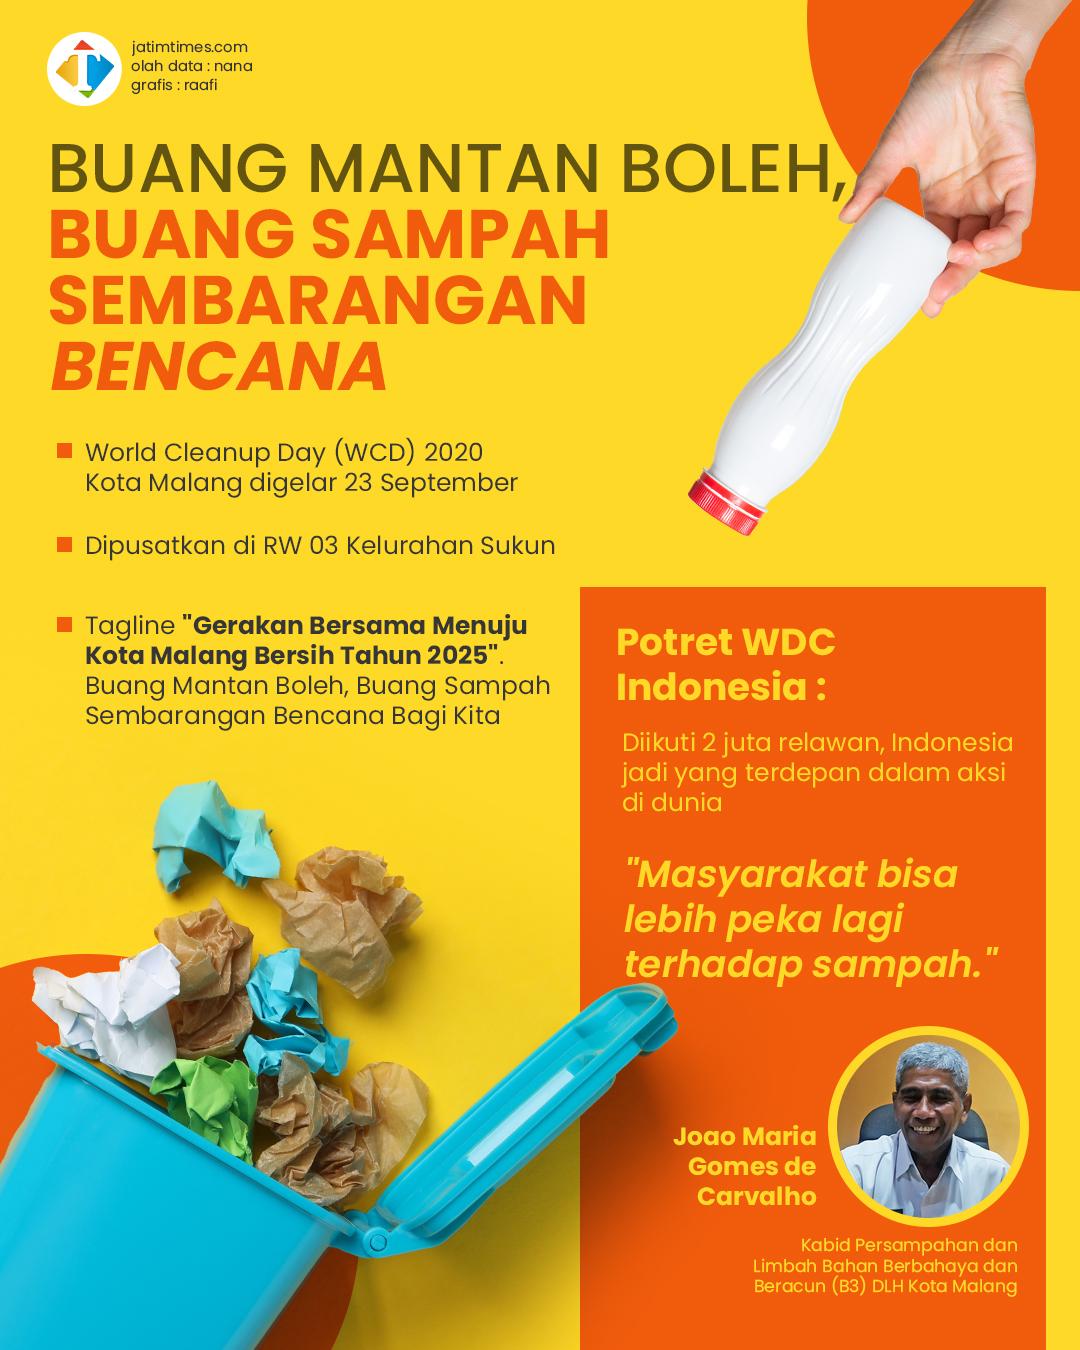 Besok, World Cleanup Day 2020 Kota Malang Terpusat di RW 03 Kelurahan Sukun